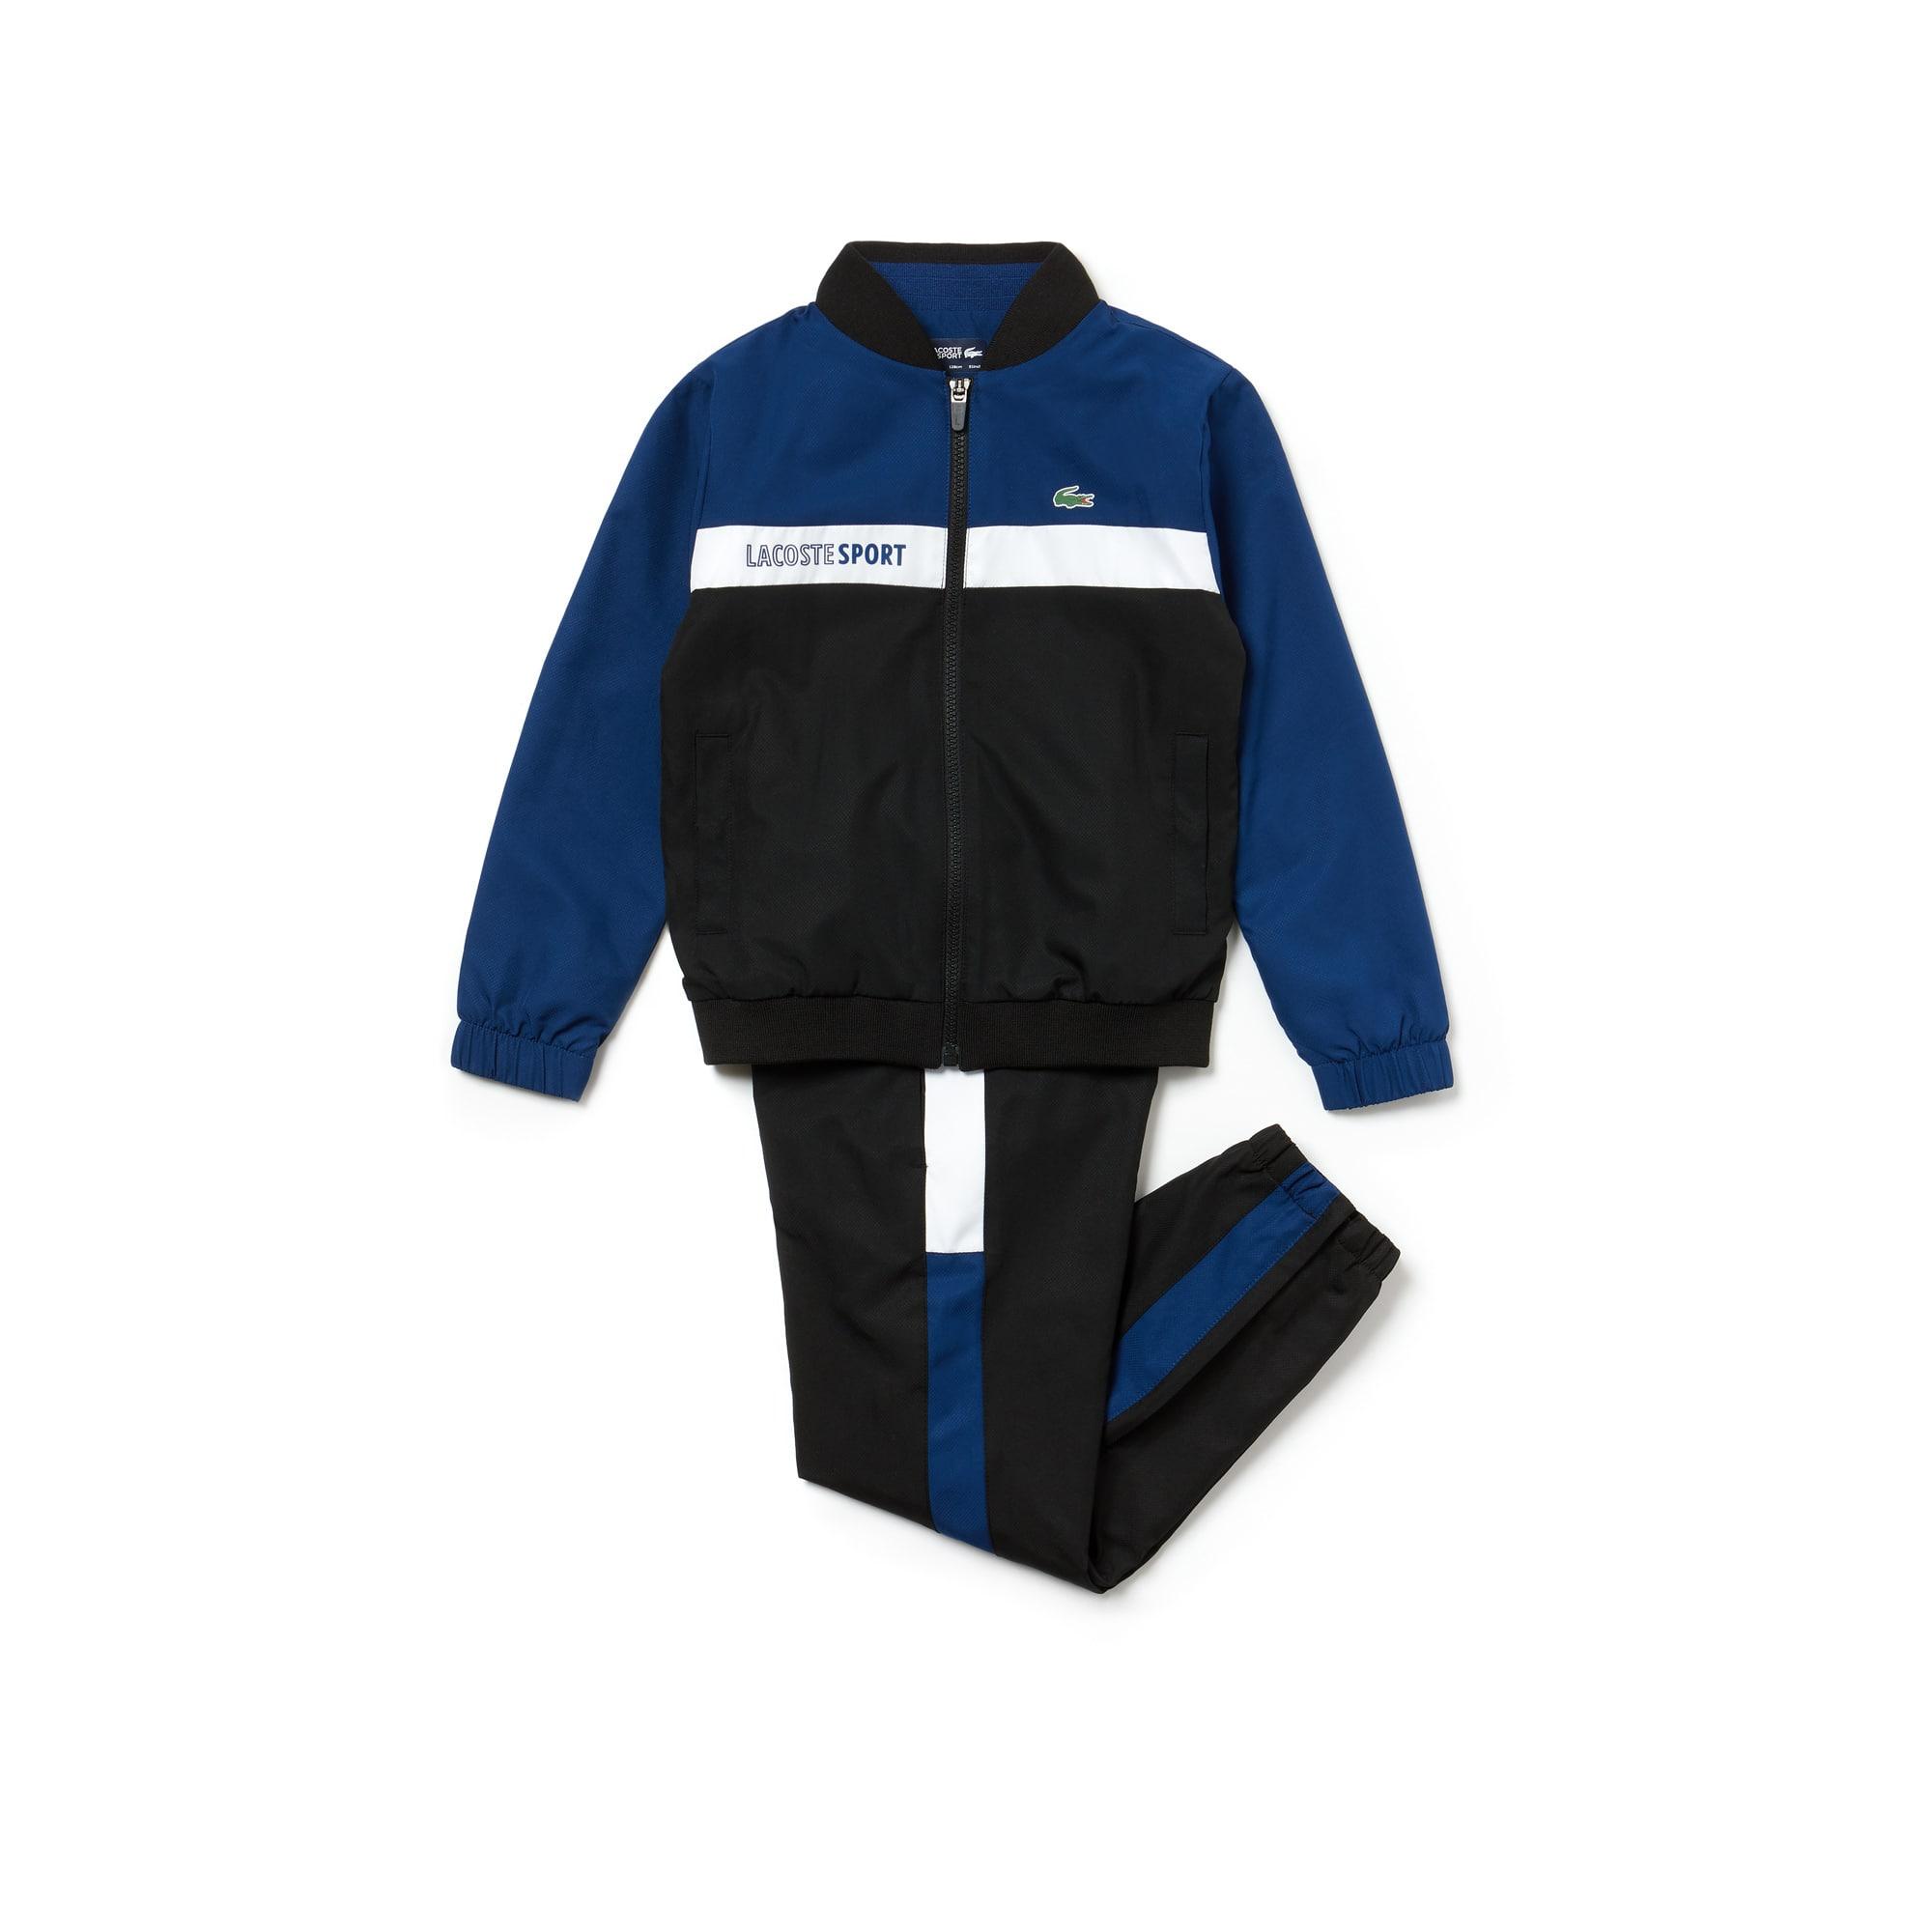 Jungen LACOSTE SPORT Taft Trainingsanzug mit Colorblocks